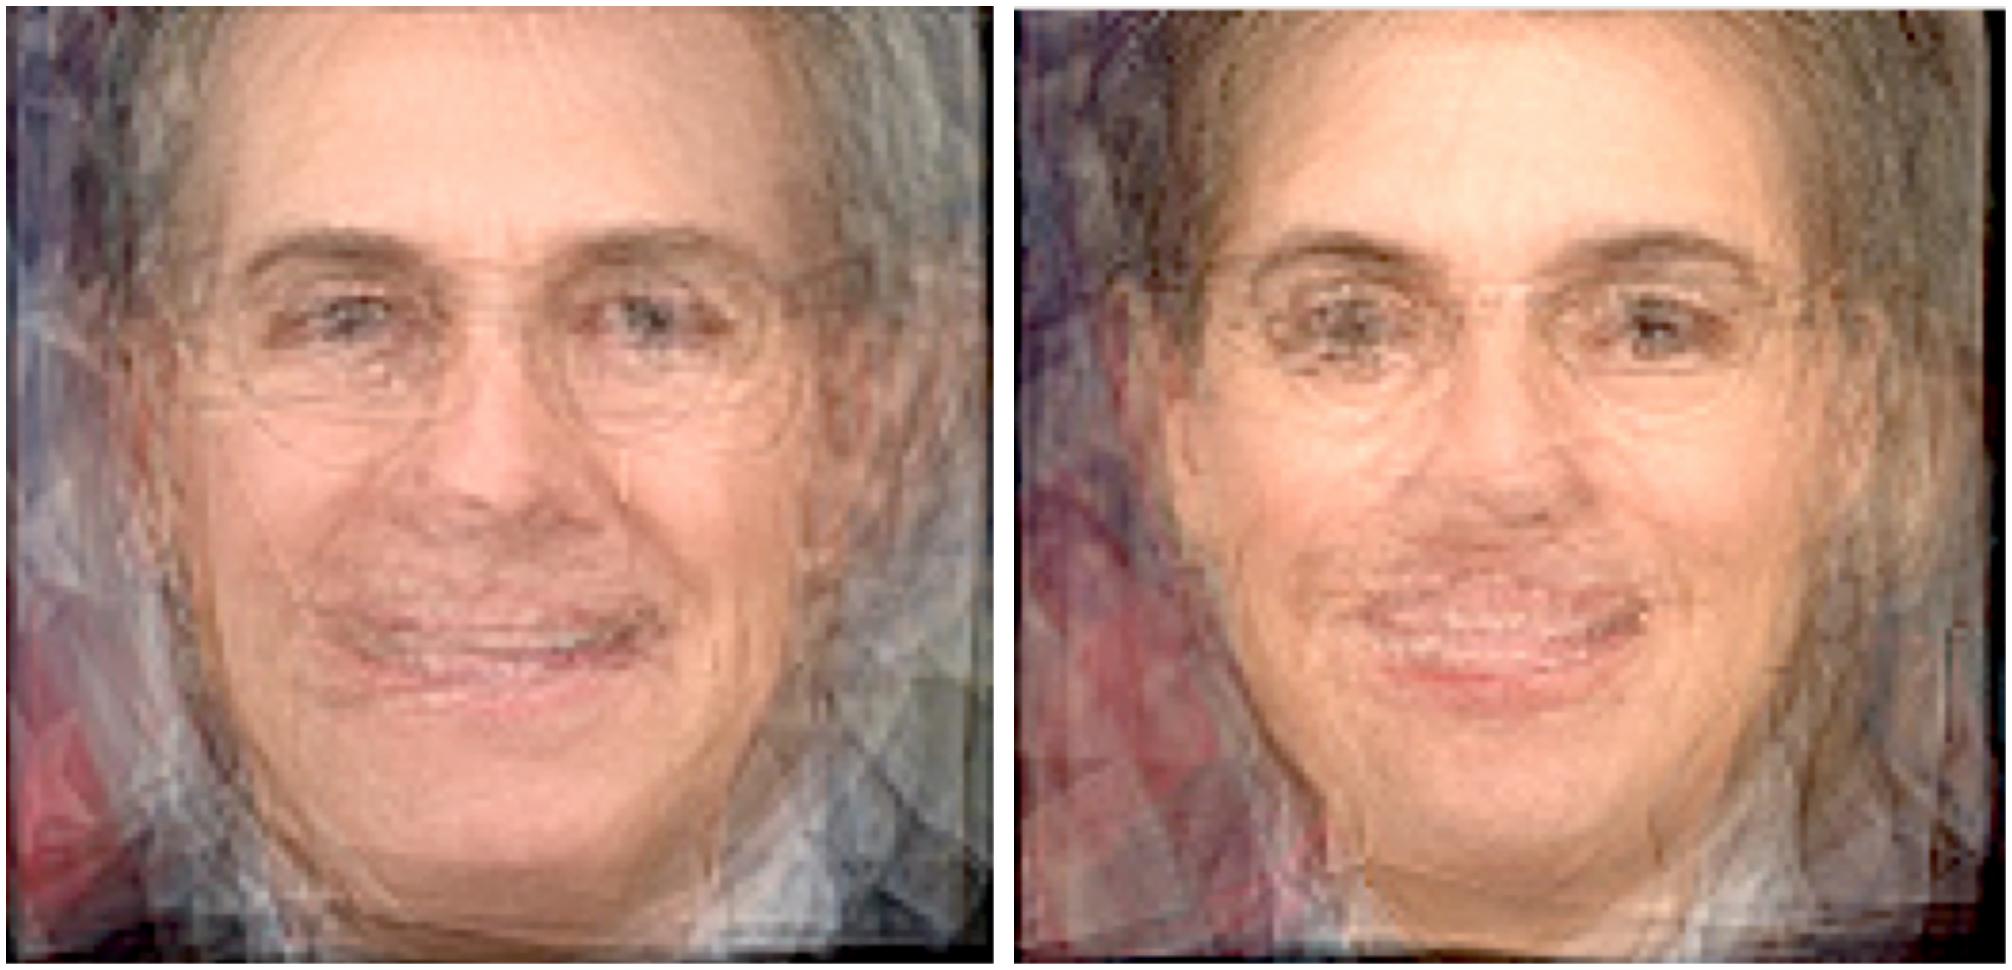 Left: Average face of a Trump Cabinet member. Right: Average face of a Obama cabinet member